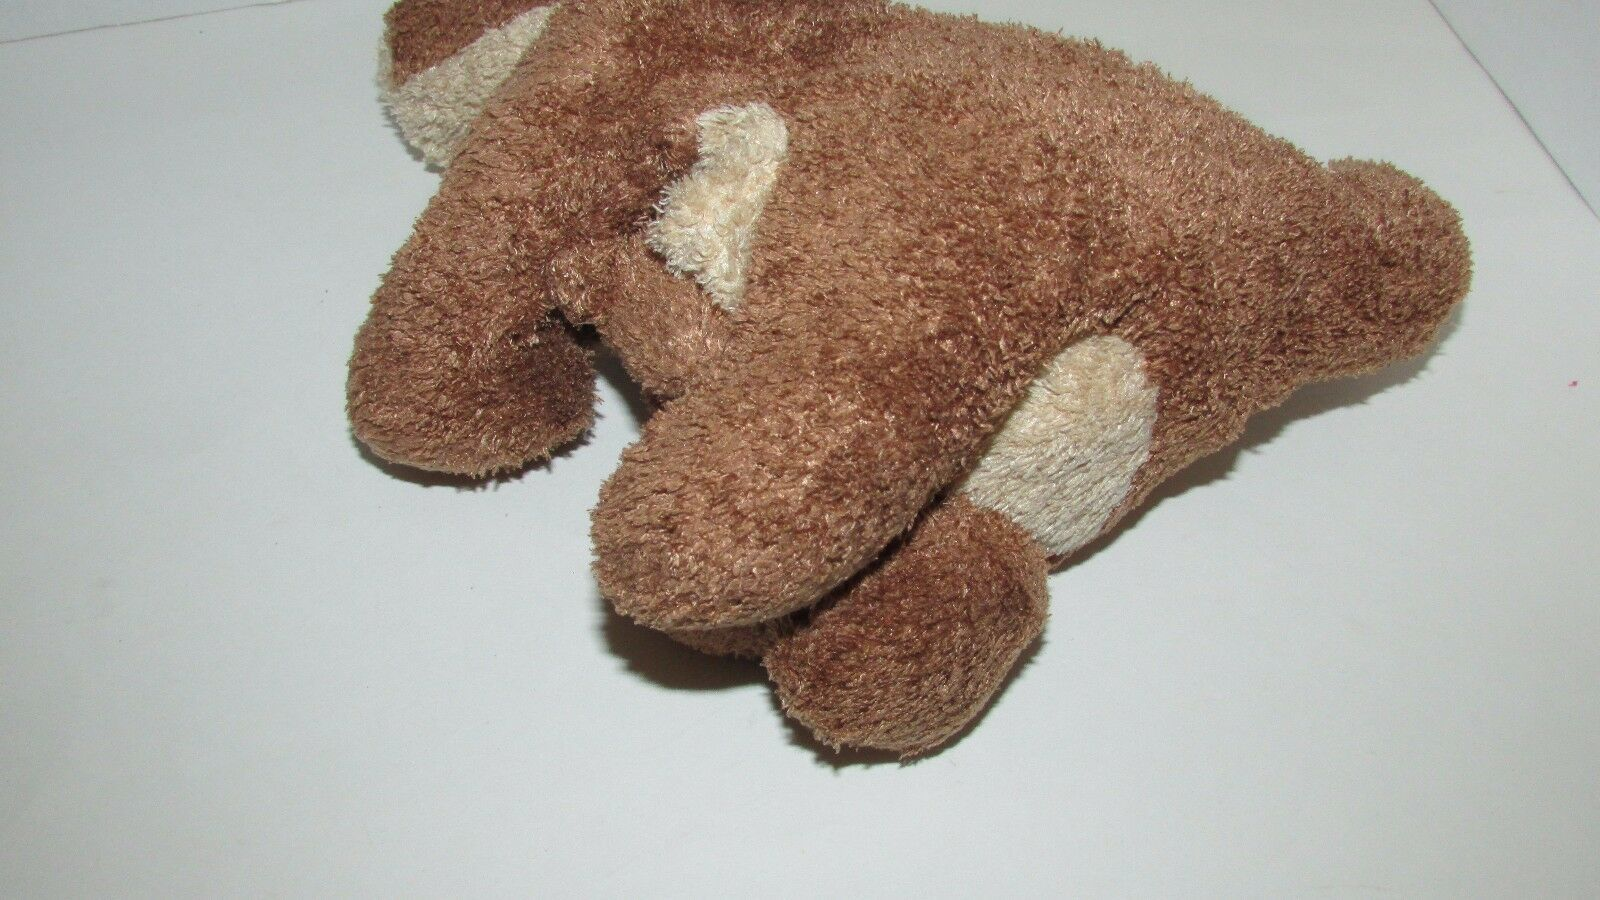 Brown cream tan Kangaroo mom baby joey beanbag plush soft floppy no tags image 5